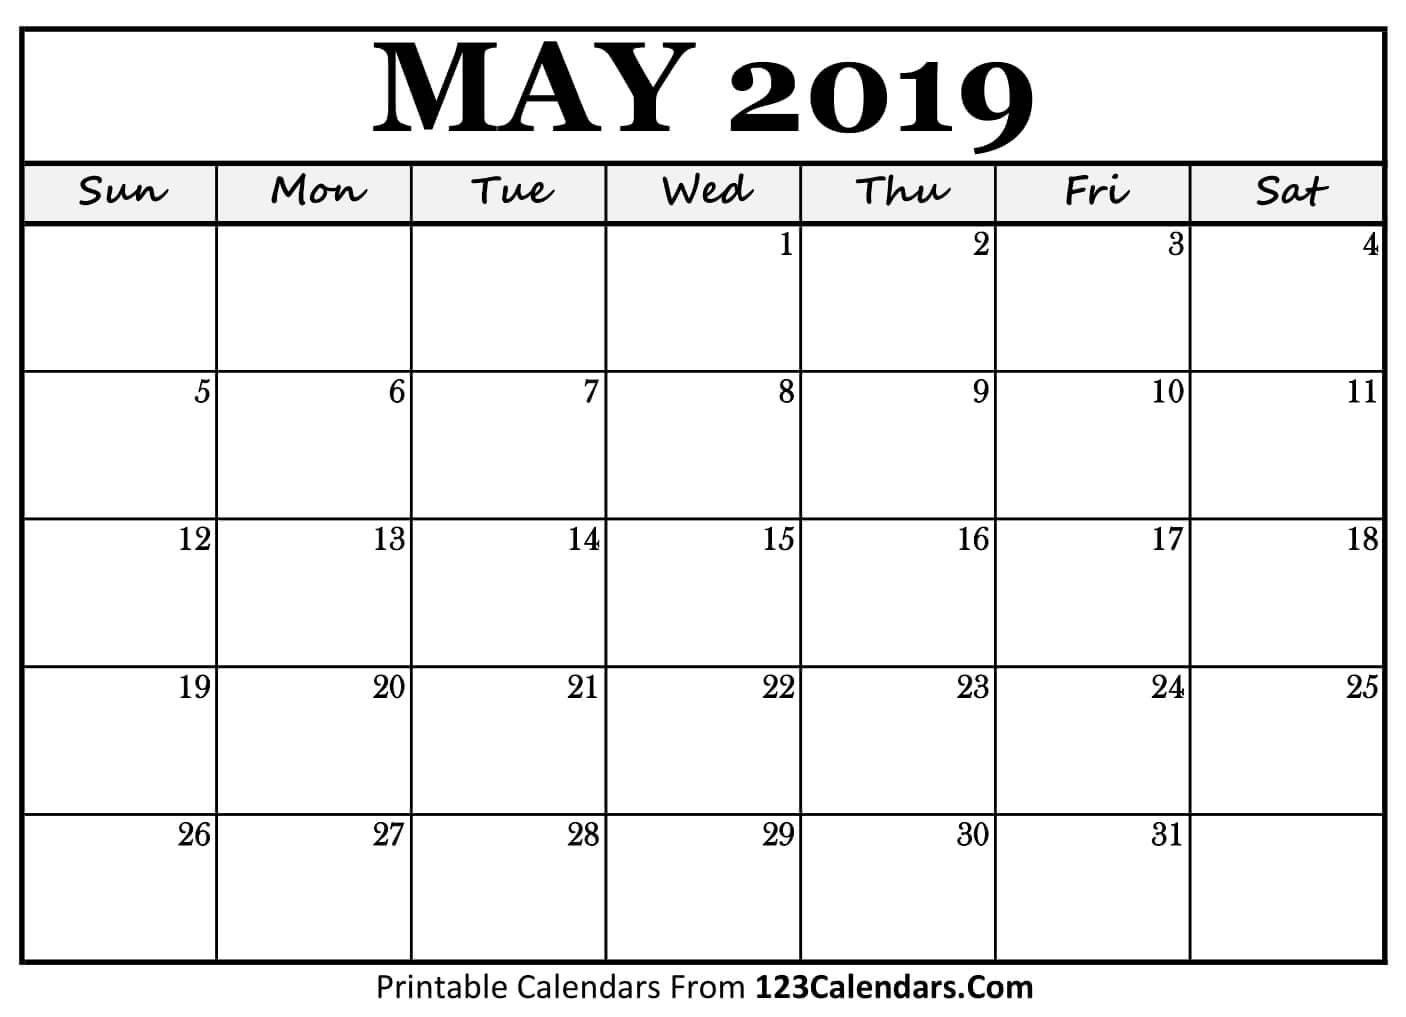 Printable May 2019 Calendar Templates - 123Calendars Calendar May 3 2019